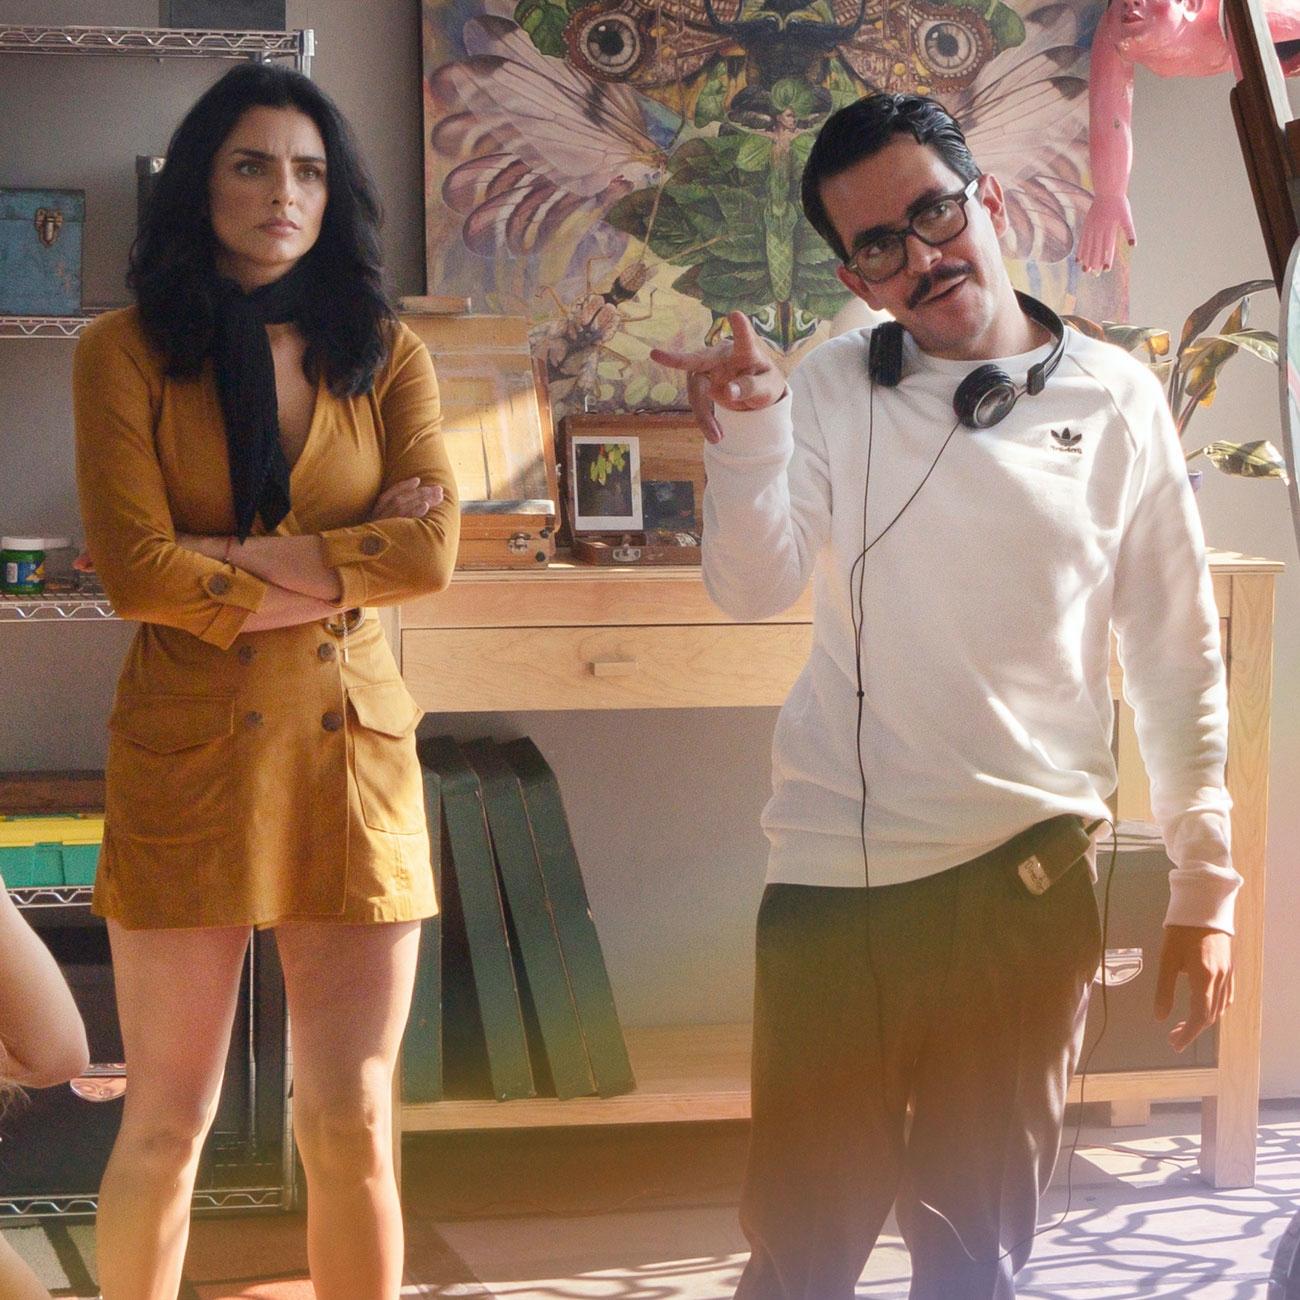 Aislinn Derbez with Manolo Caro on set